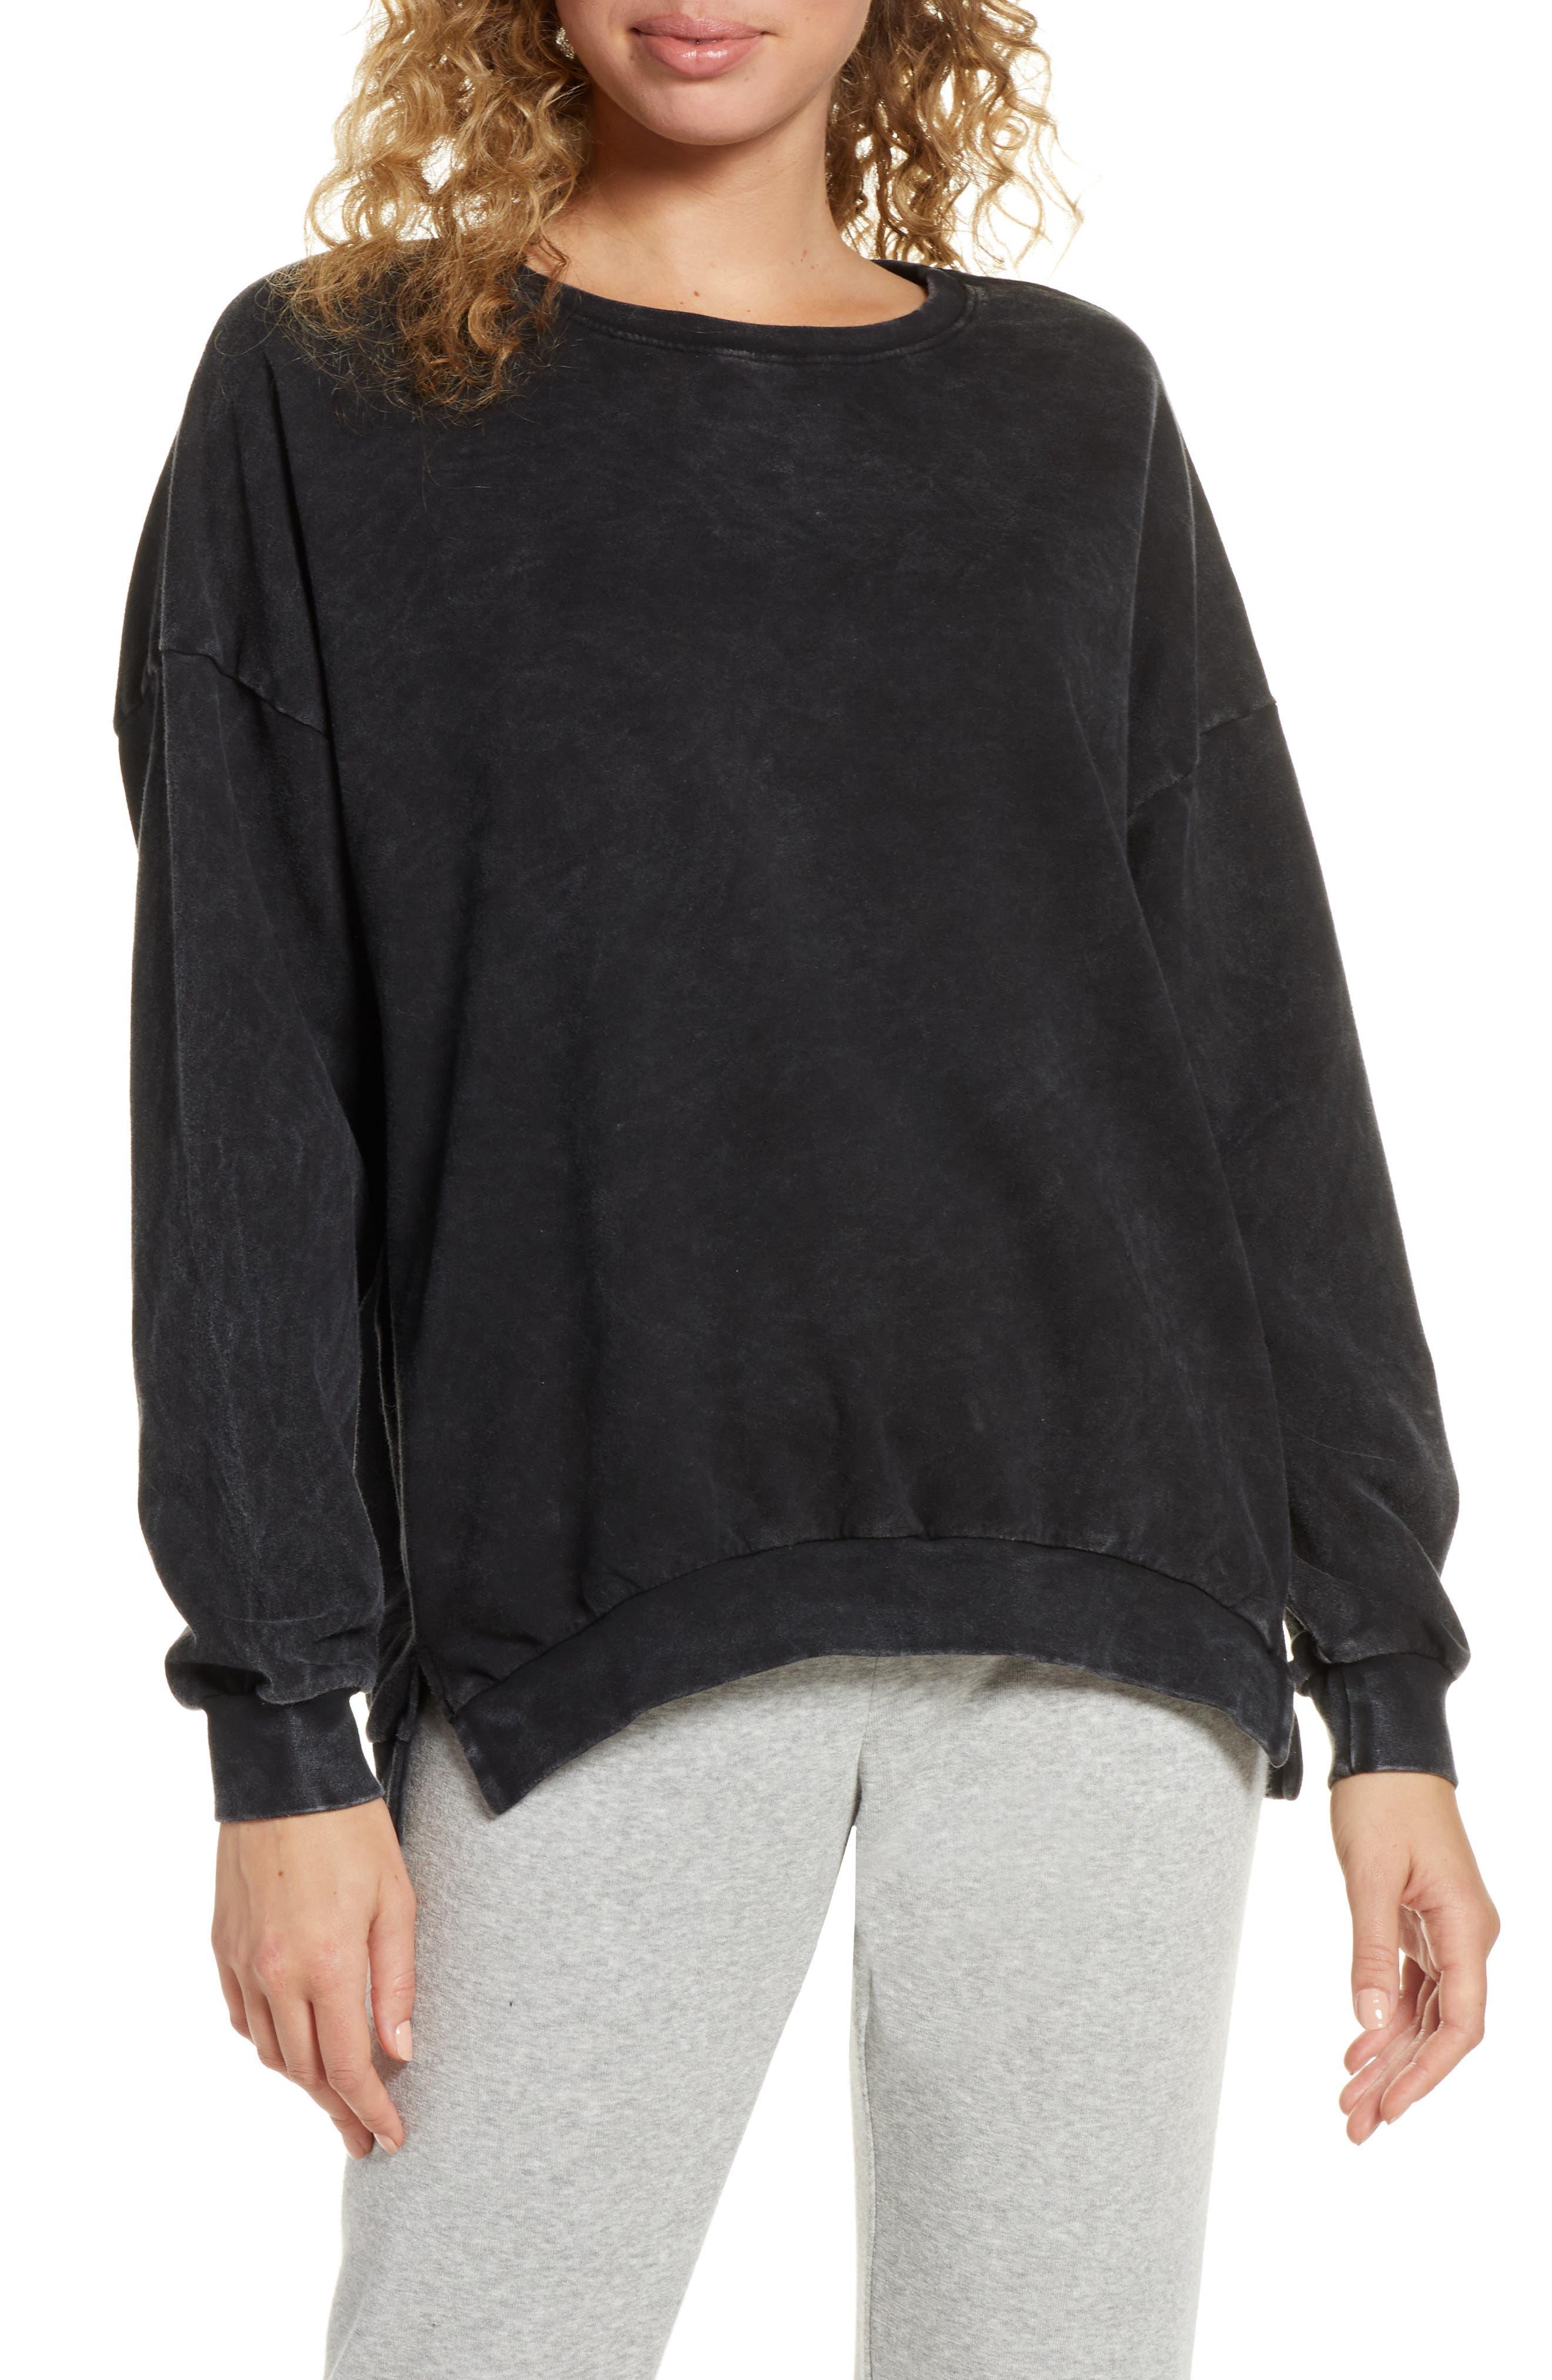 Project Social T Realized Mineral Wash Sweatshirt, Black